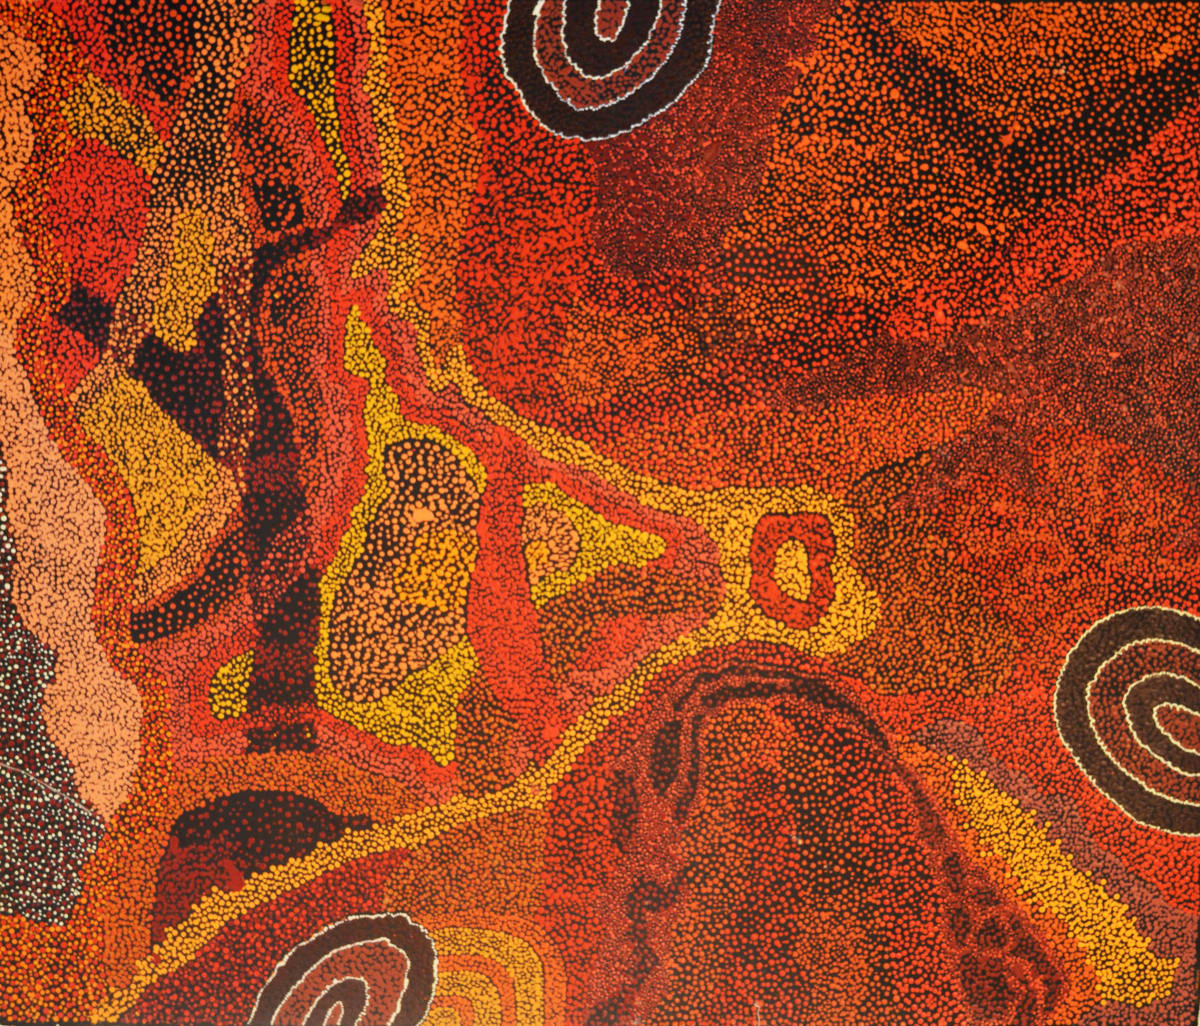 Marita Baker Kalaya Tjukurpa acrylic on canvas 120 x 100 cm